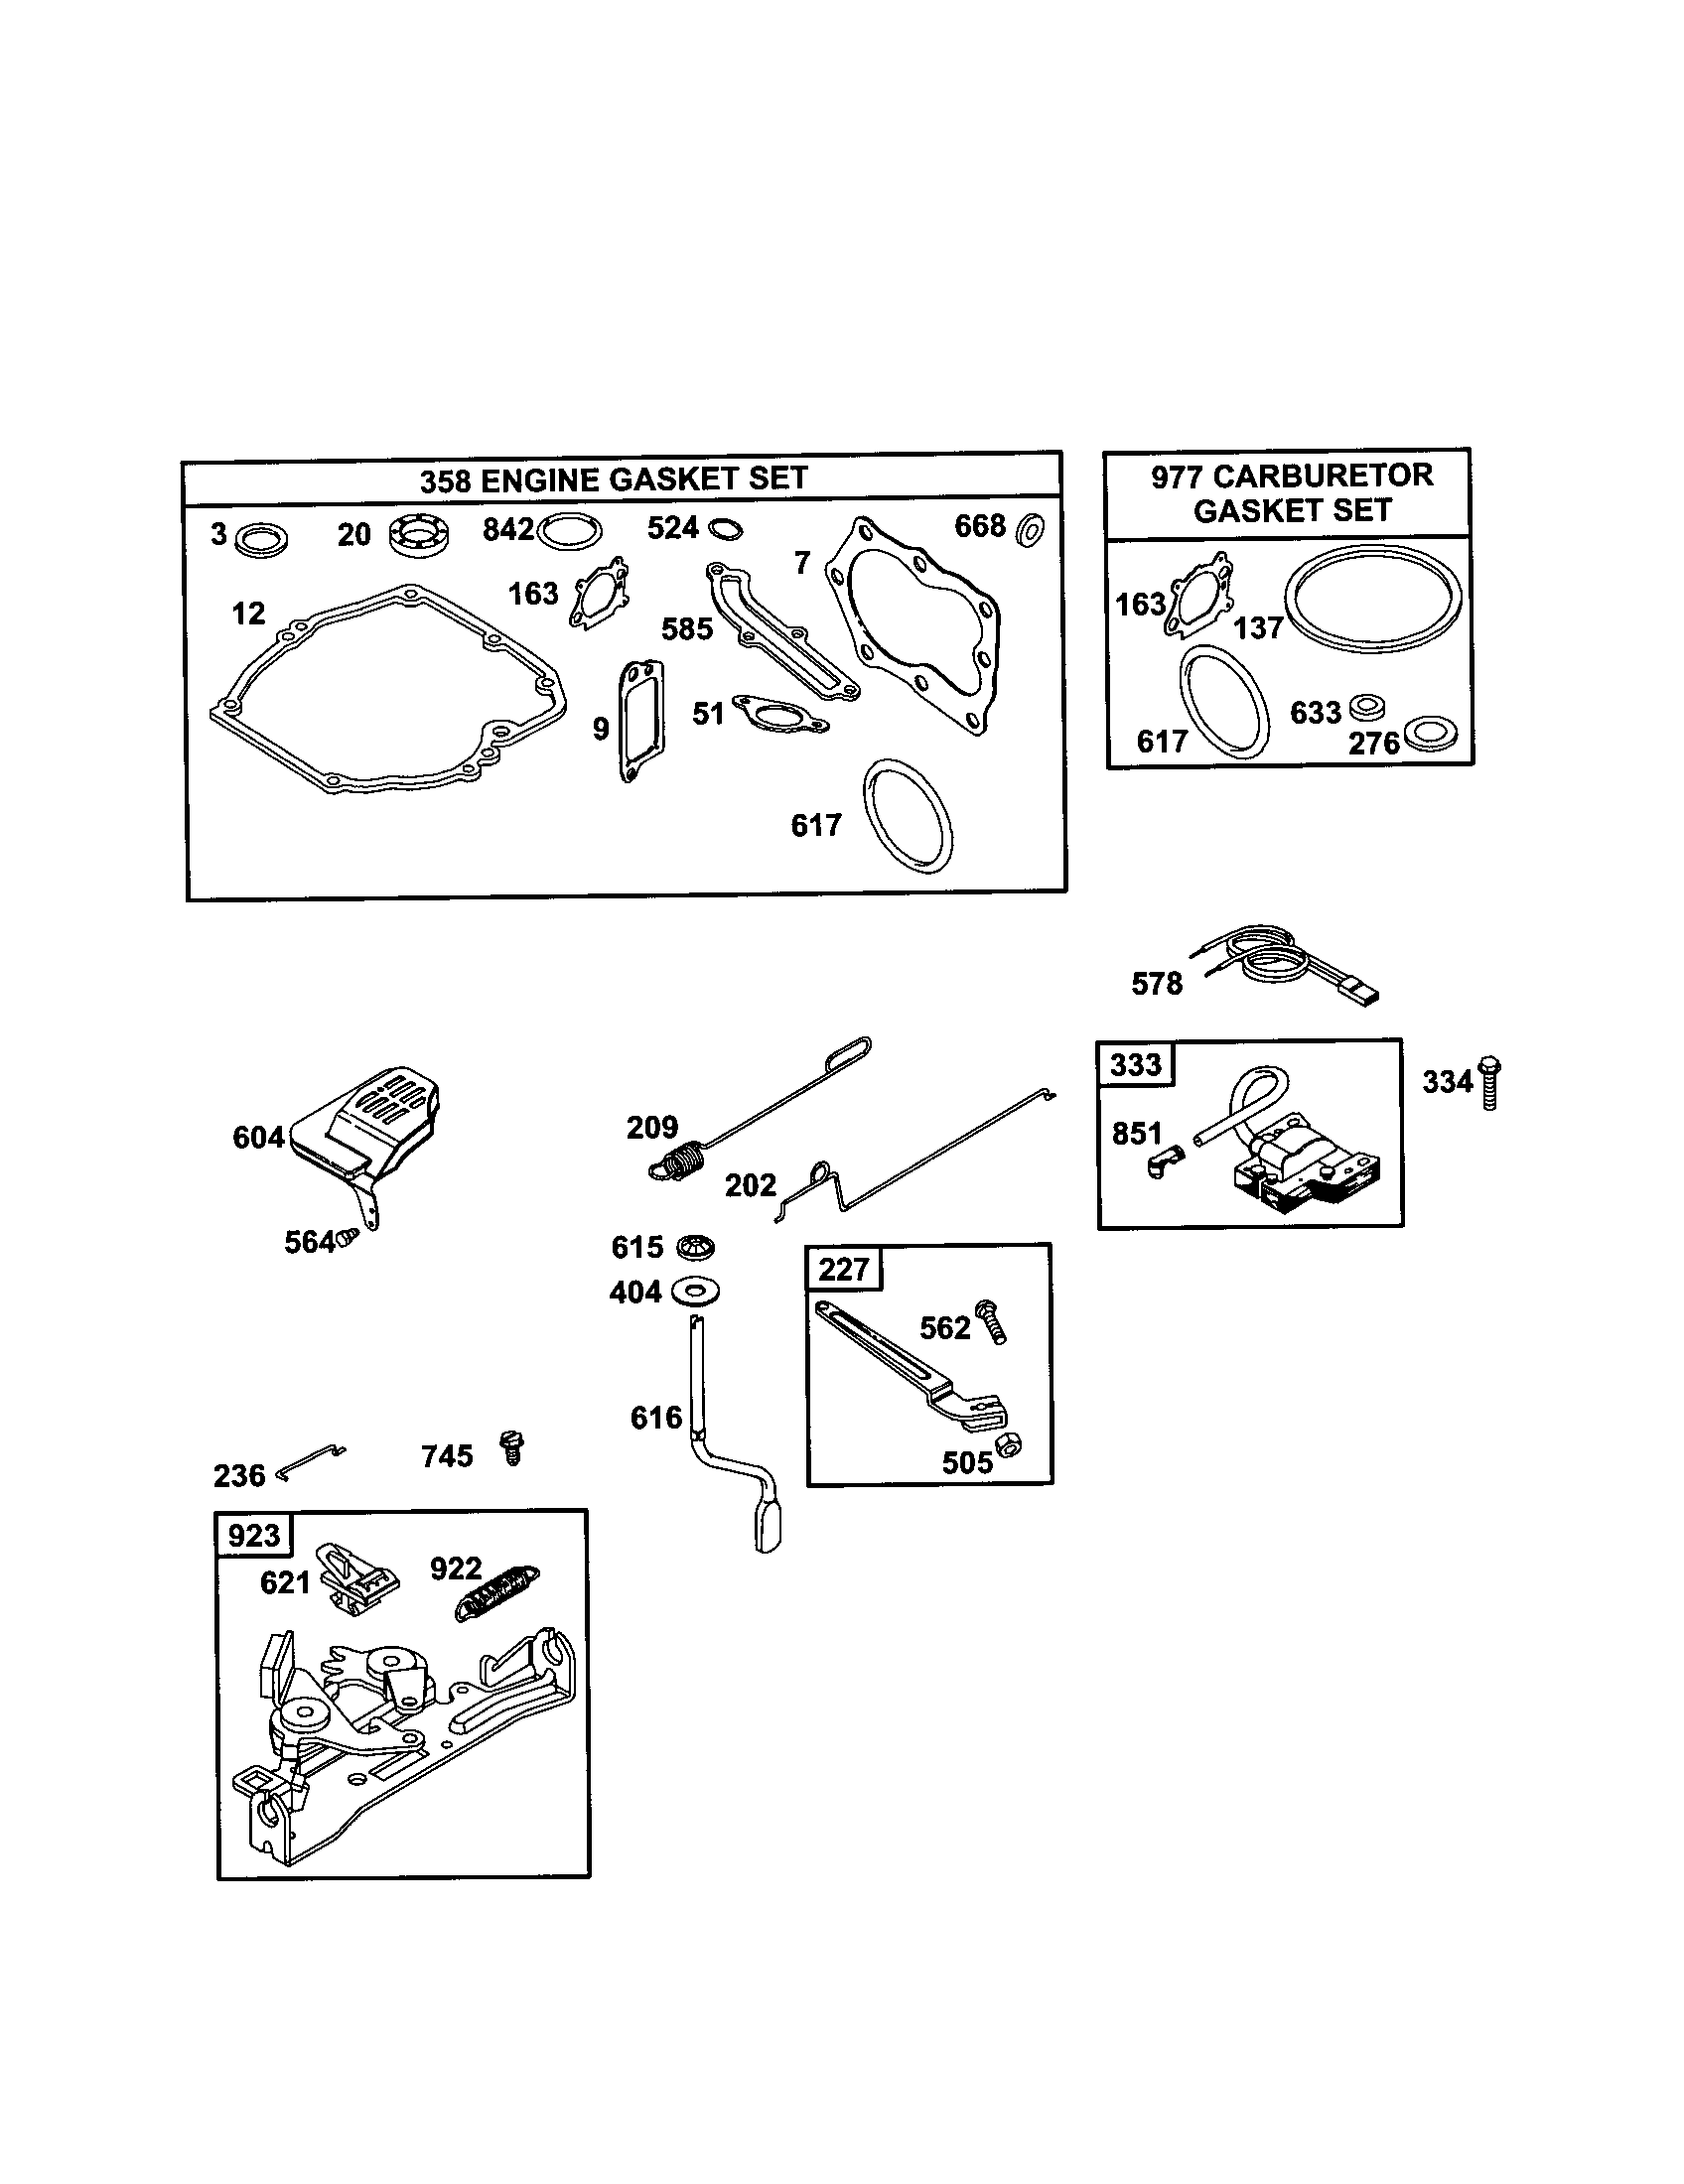 hight resolution of briggs stratton 12j802 2915 b2 engine gasket set diagram